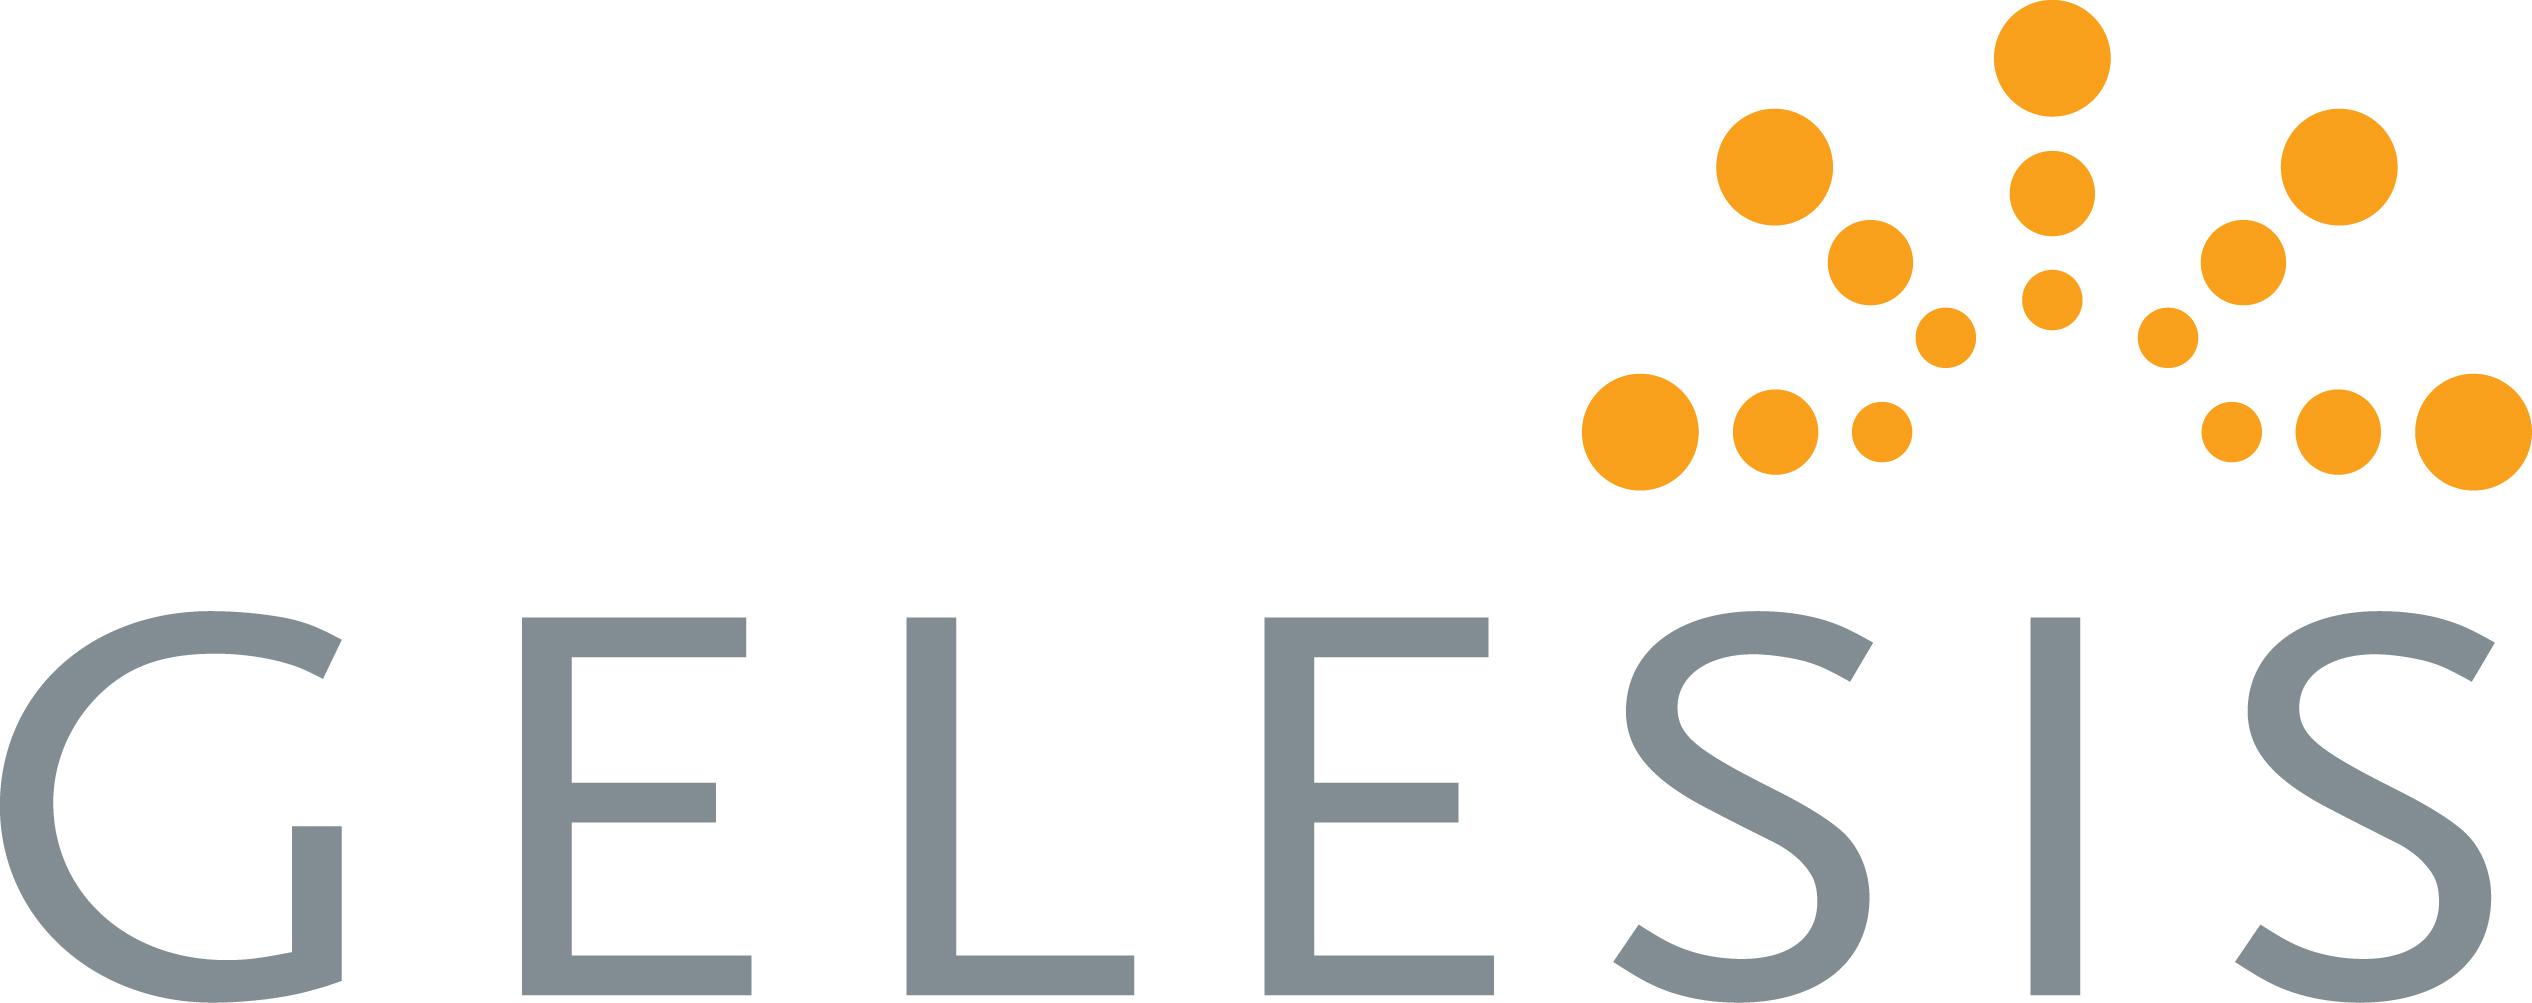 Gelesis logo